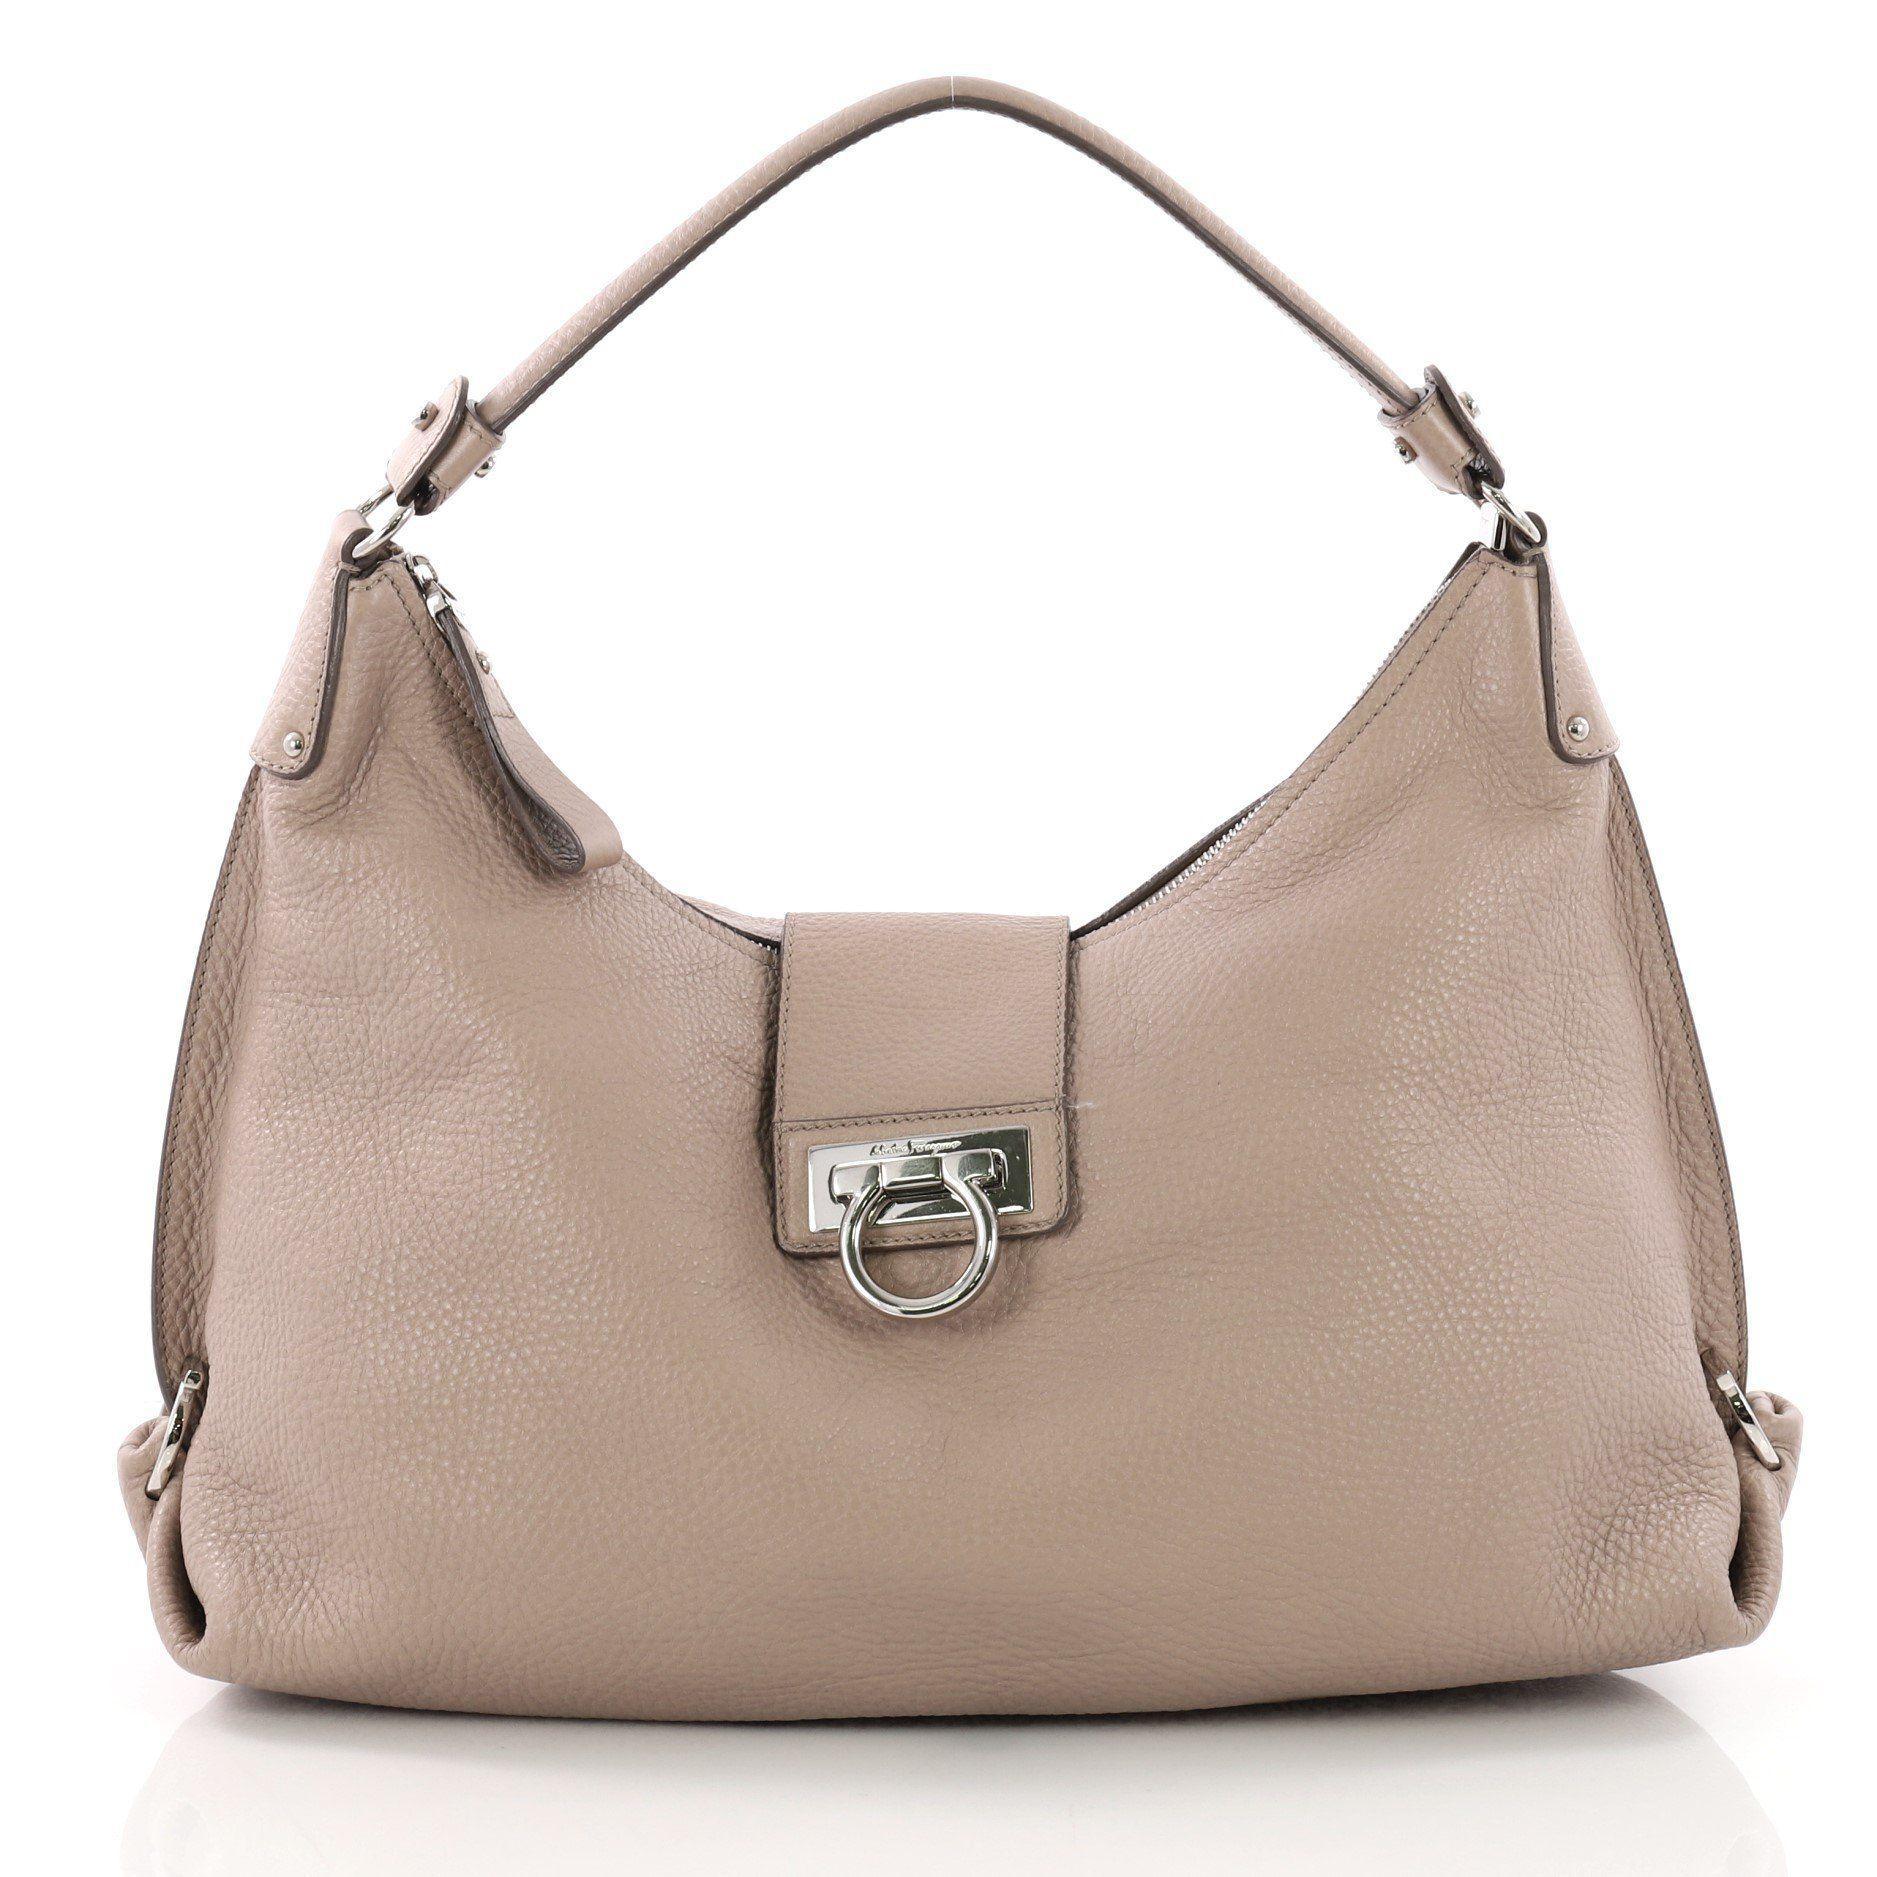 951ecdabf58e Lyst - Ferragamo Pre Owned Fanisa Hobo Leather Medium